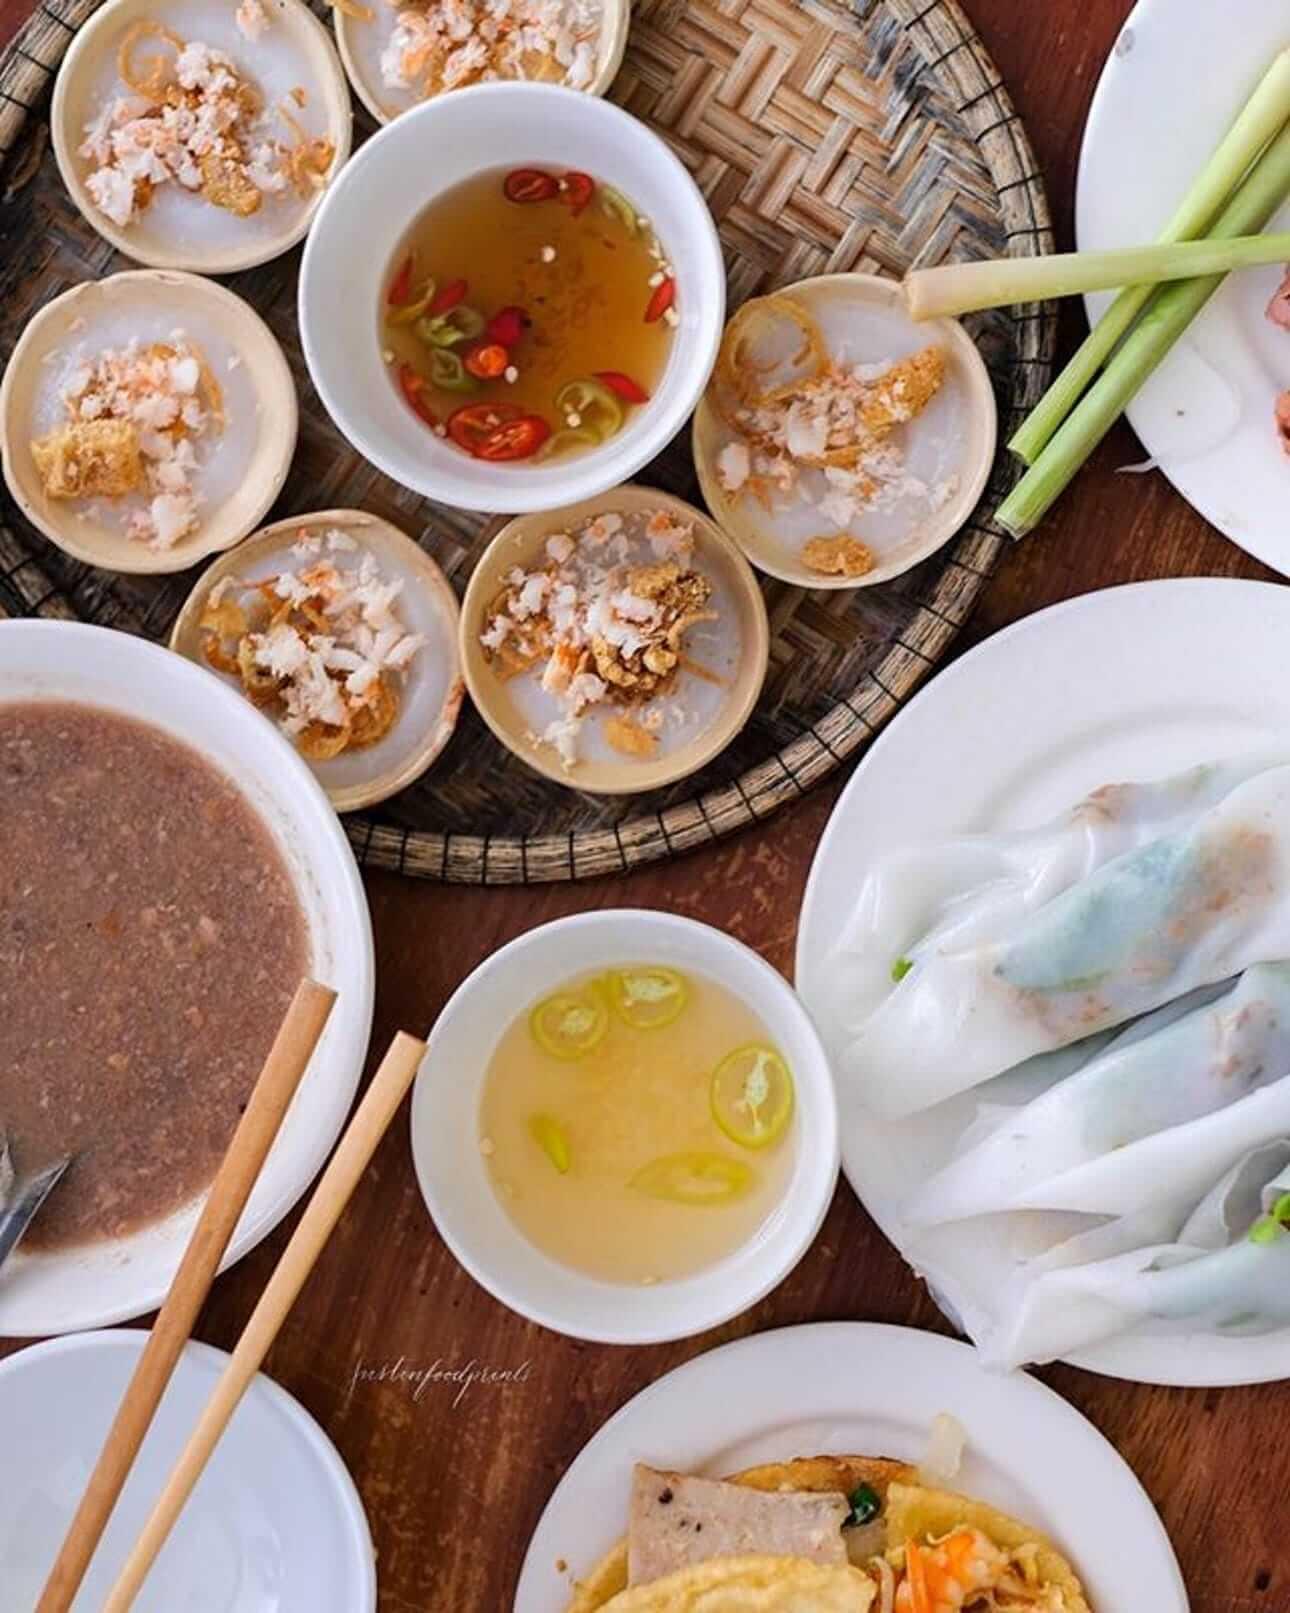 Hanh Restaurant's wonderful spread of Hue Specialty food